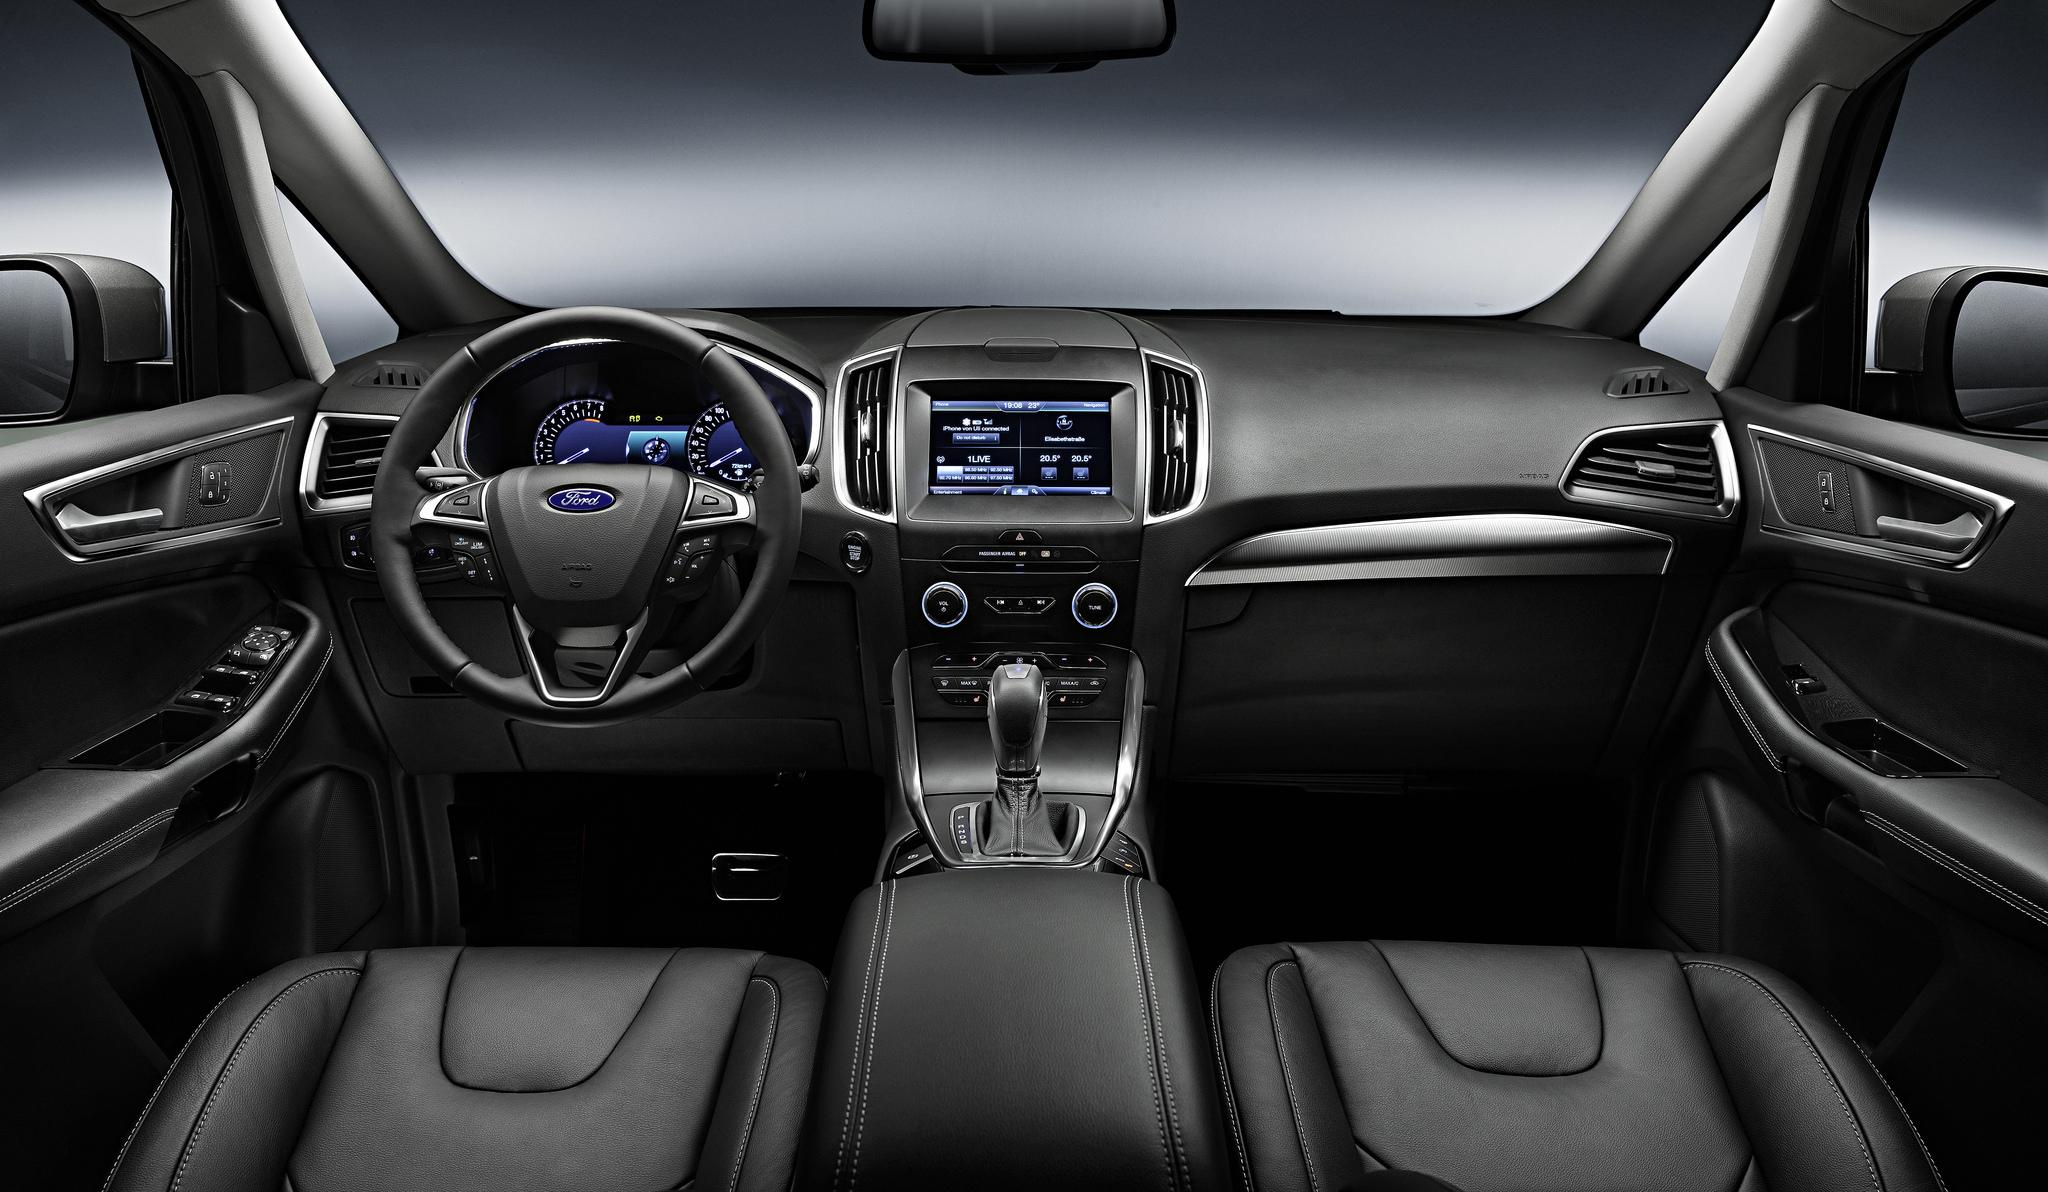 2015 yeni kasa ford s max 6 150x150 2015 Yeni Kasa Ford S Max Ortaya